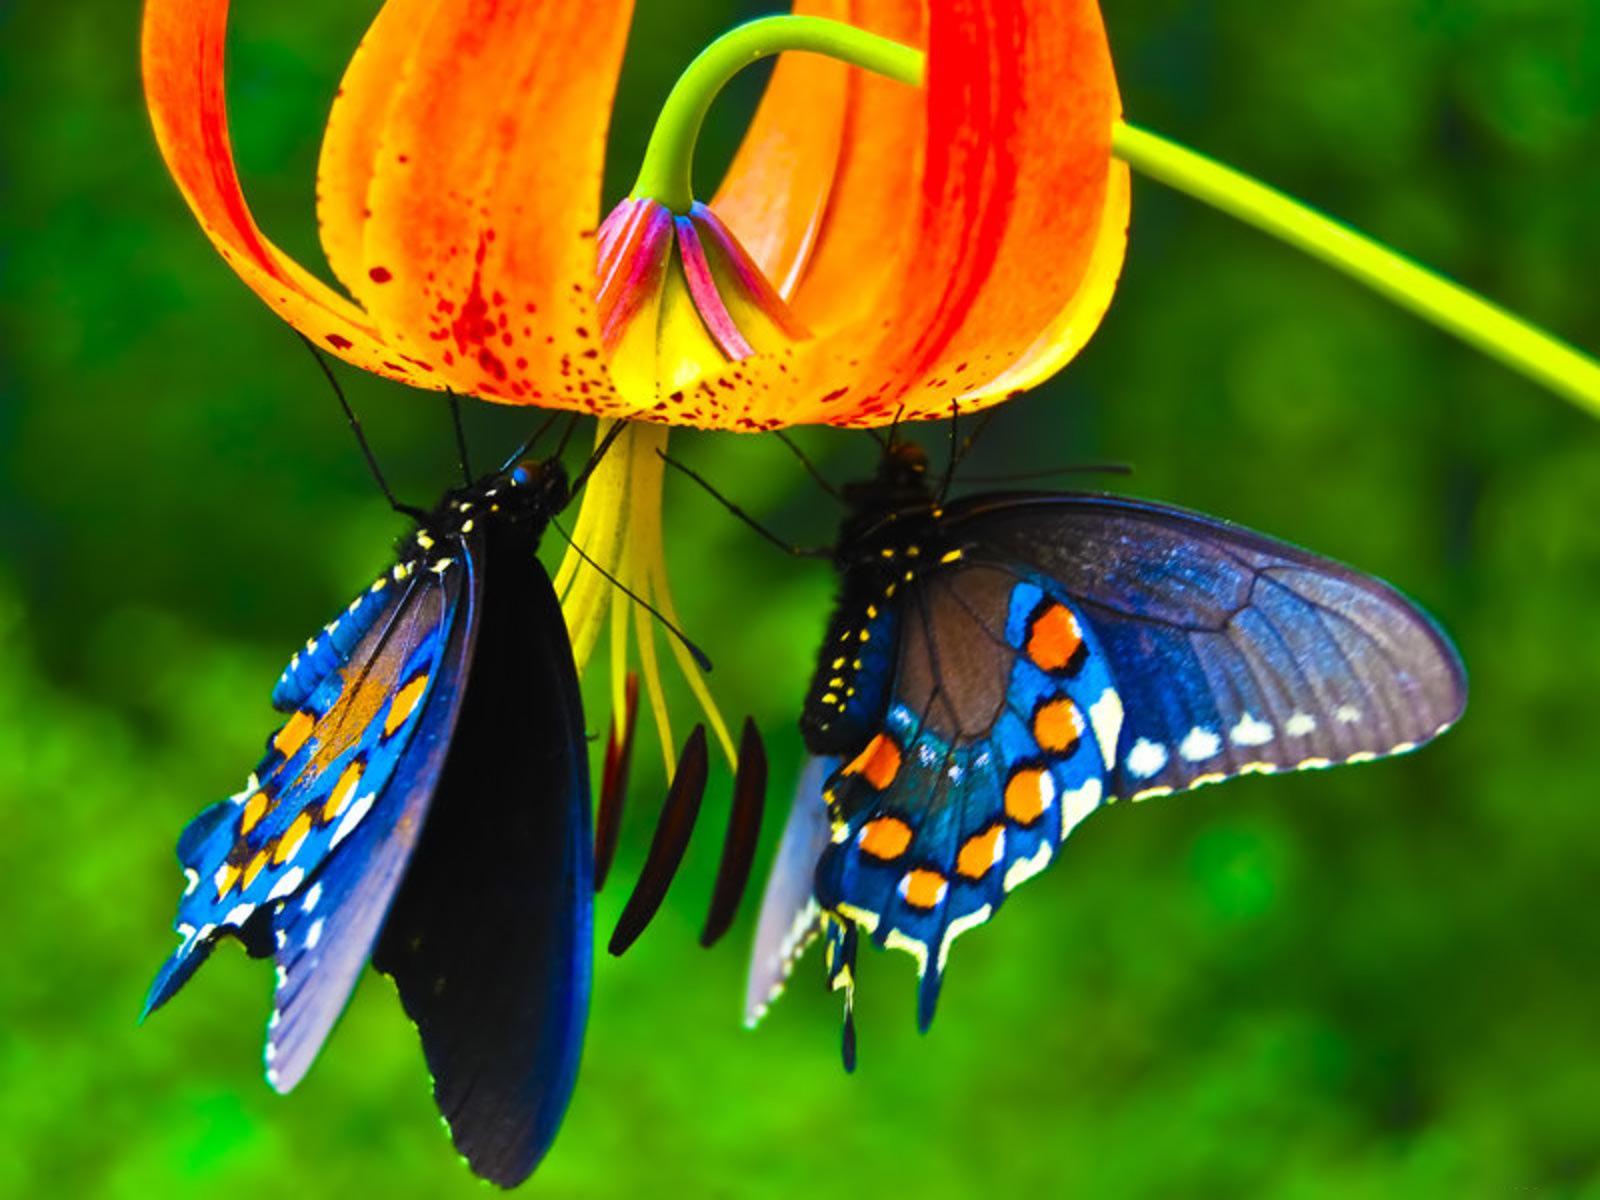 Description King Priamos Butterfly Wallpaper is a hi res Wallpaper 1600x1200